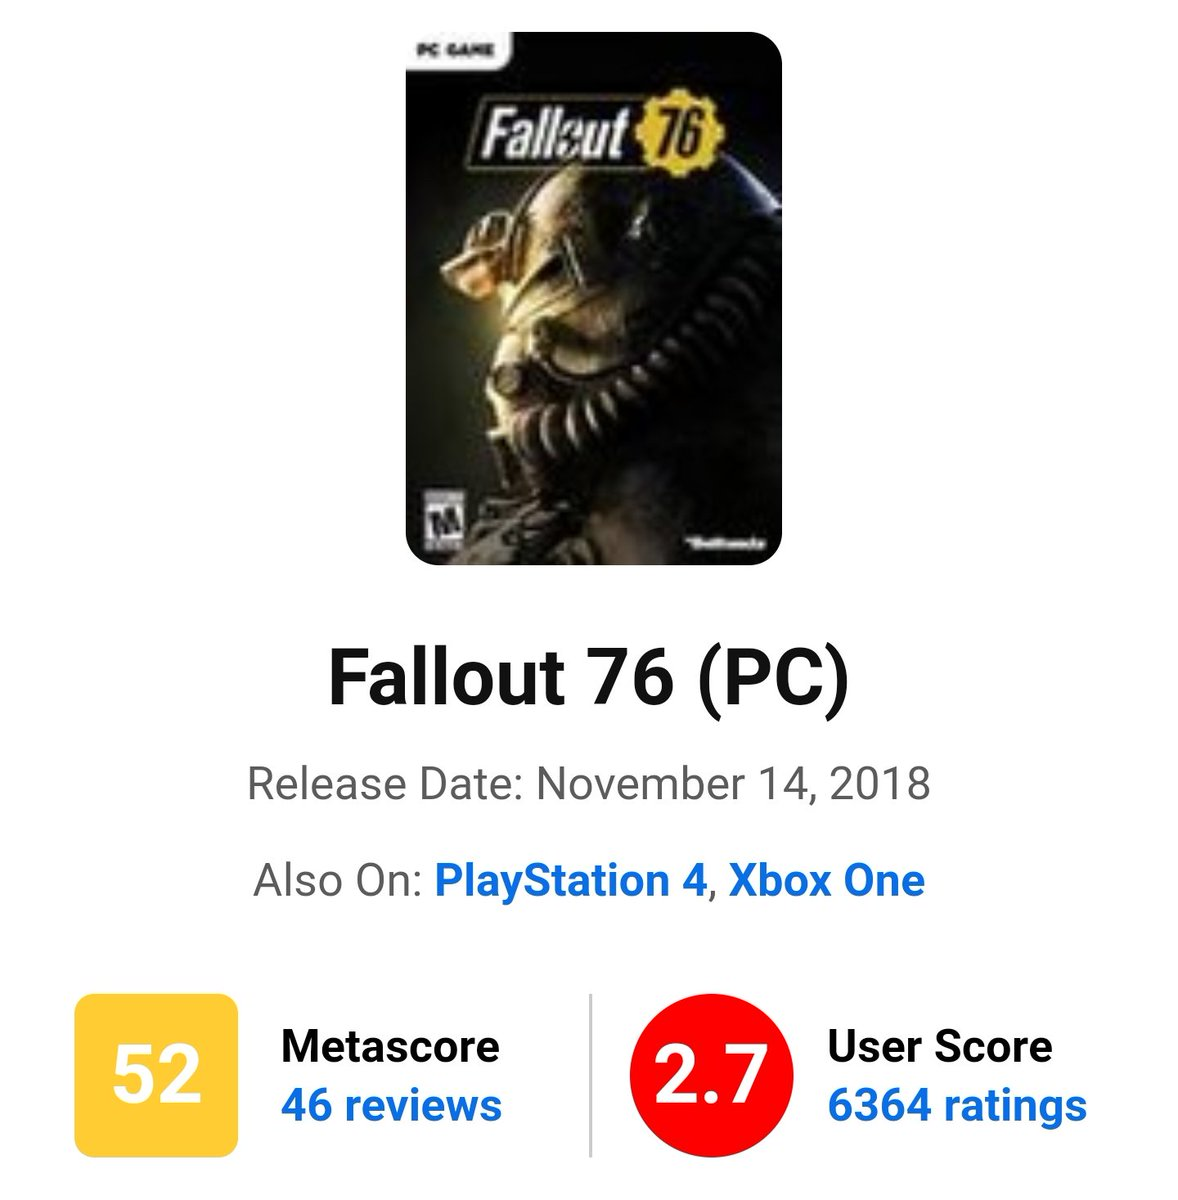 Fallout 76: 3 Year long Outrage.  6k reviews.  Battlefield 5: 1 Year long outrage.  2k reviews.  Anthem: 2 Year long outrage.  3k reviews.  MGSurvive: 1 year long outrage.  200 reviews.  TLOU2: 2 Months Outrage.  +100k reviews,  HOW? pic.twitter.com/b6bbFFj90t